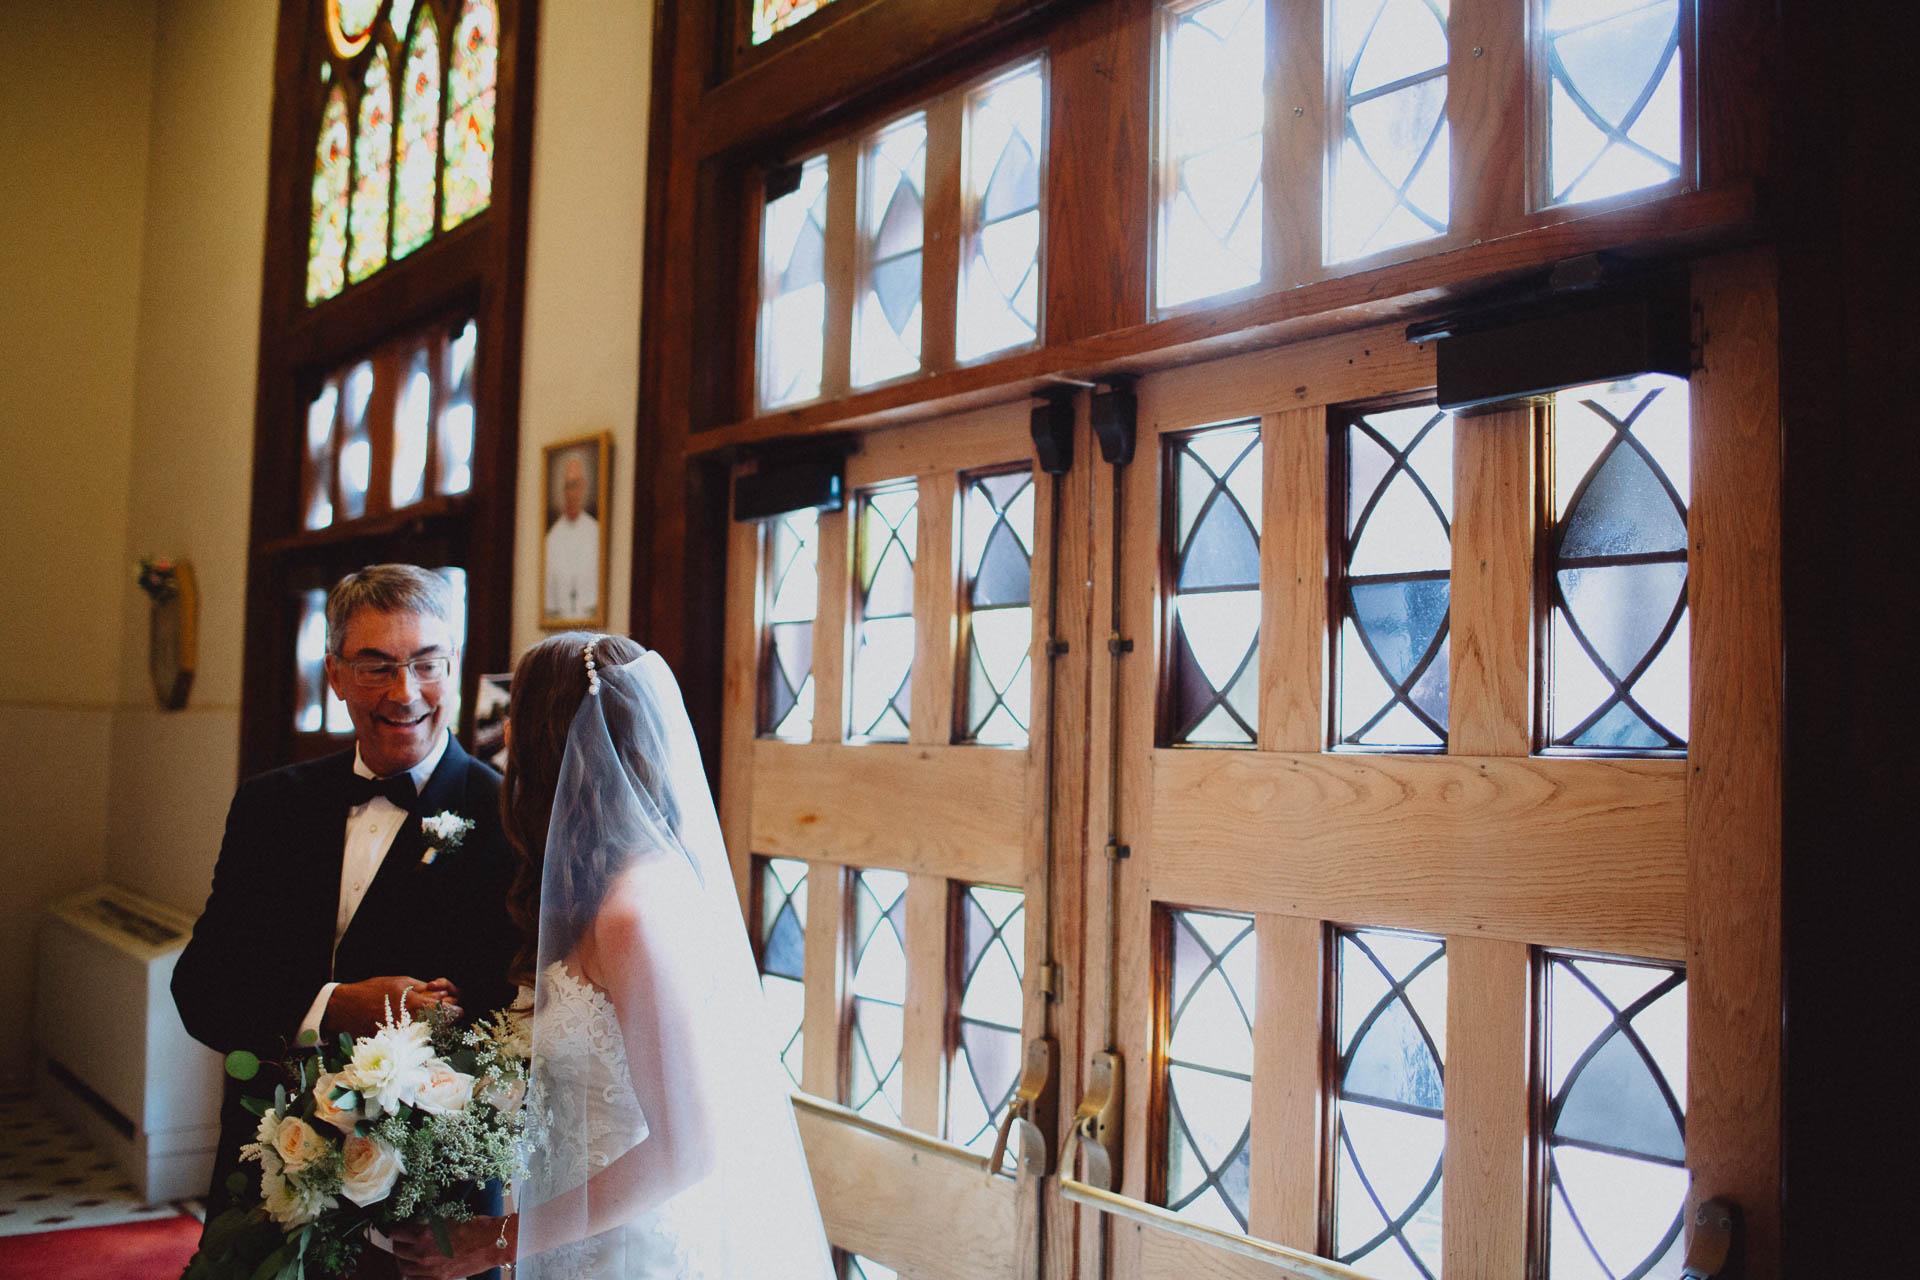 Keri-Joseph-Top-of-the-Market-Wedding-064@2x.jpg